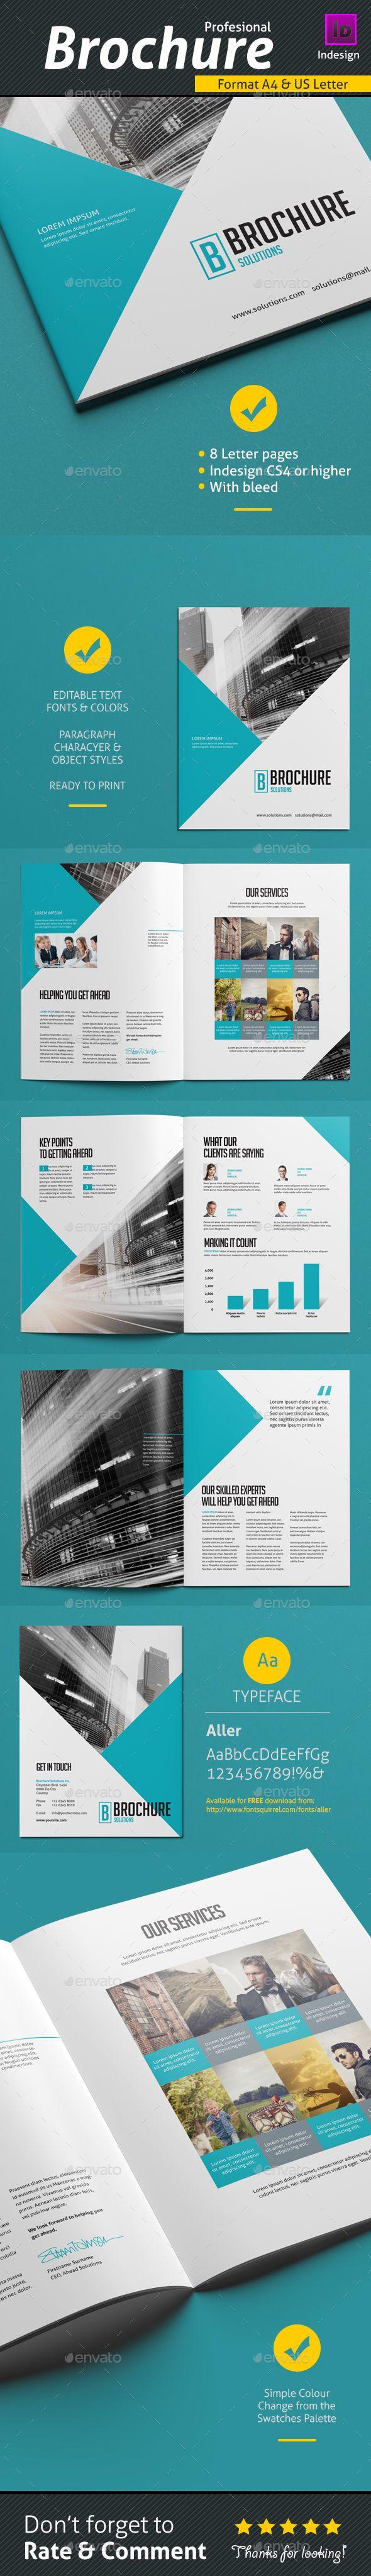 Brochure Template V1 - Brochures Print Templates                                                                                                                                                                                 More